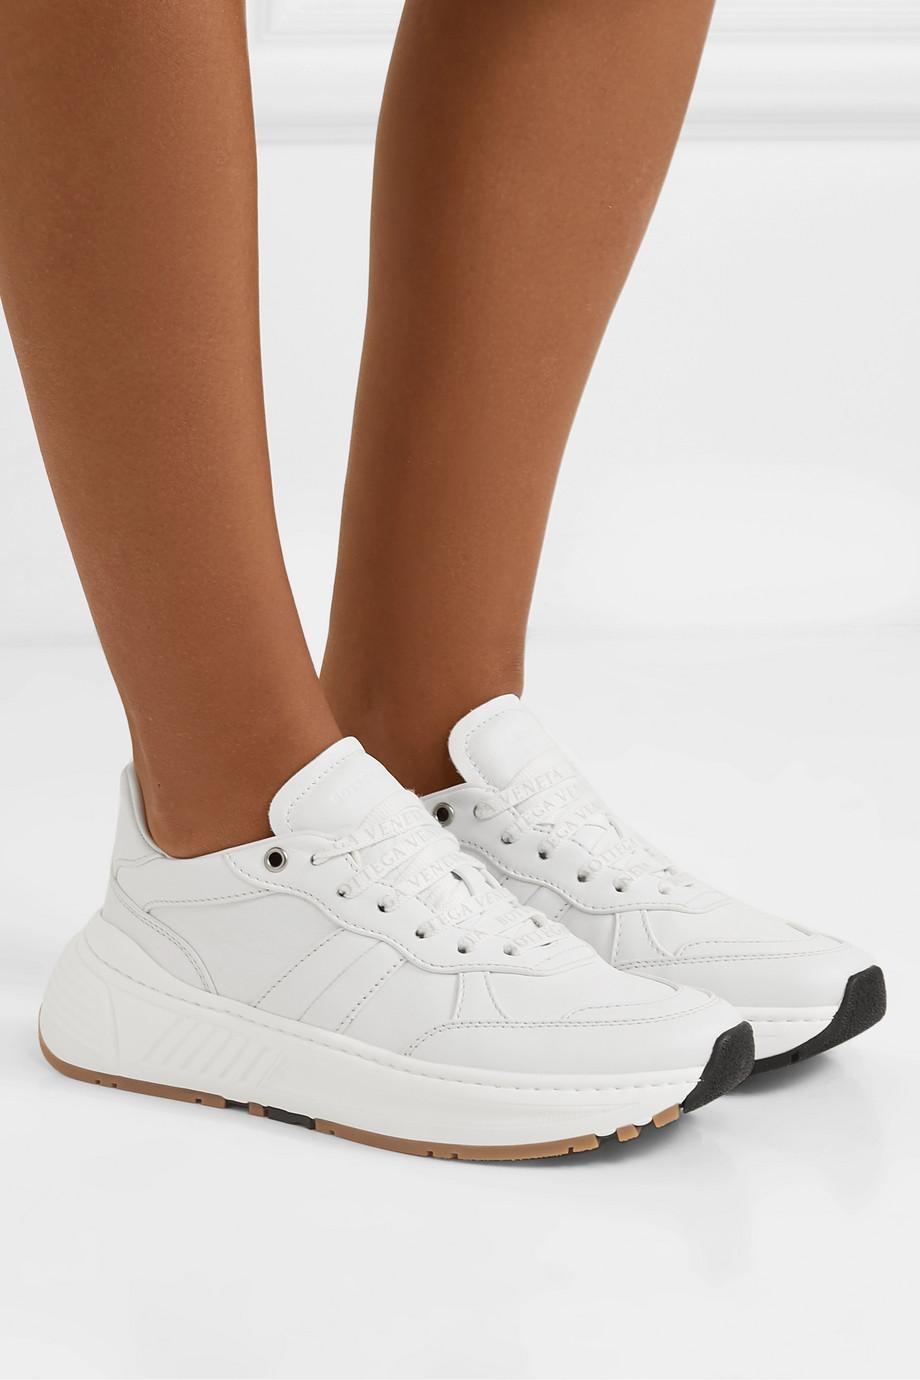 Bottega Veneta Speedster 皮革运动鞋